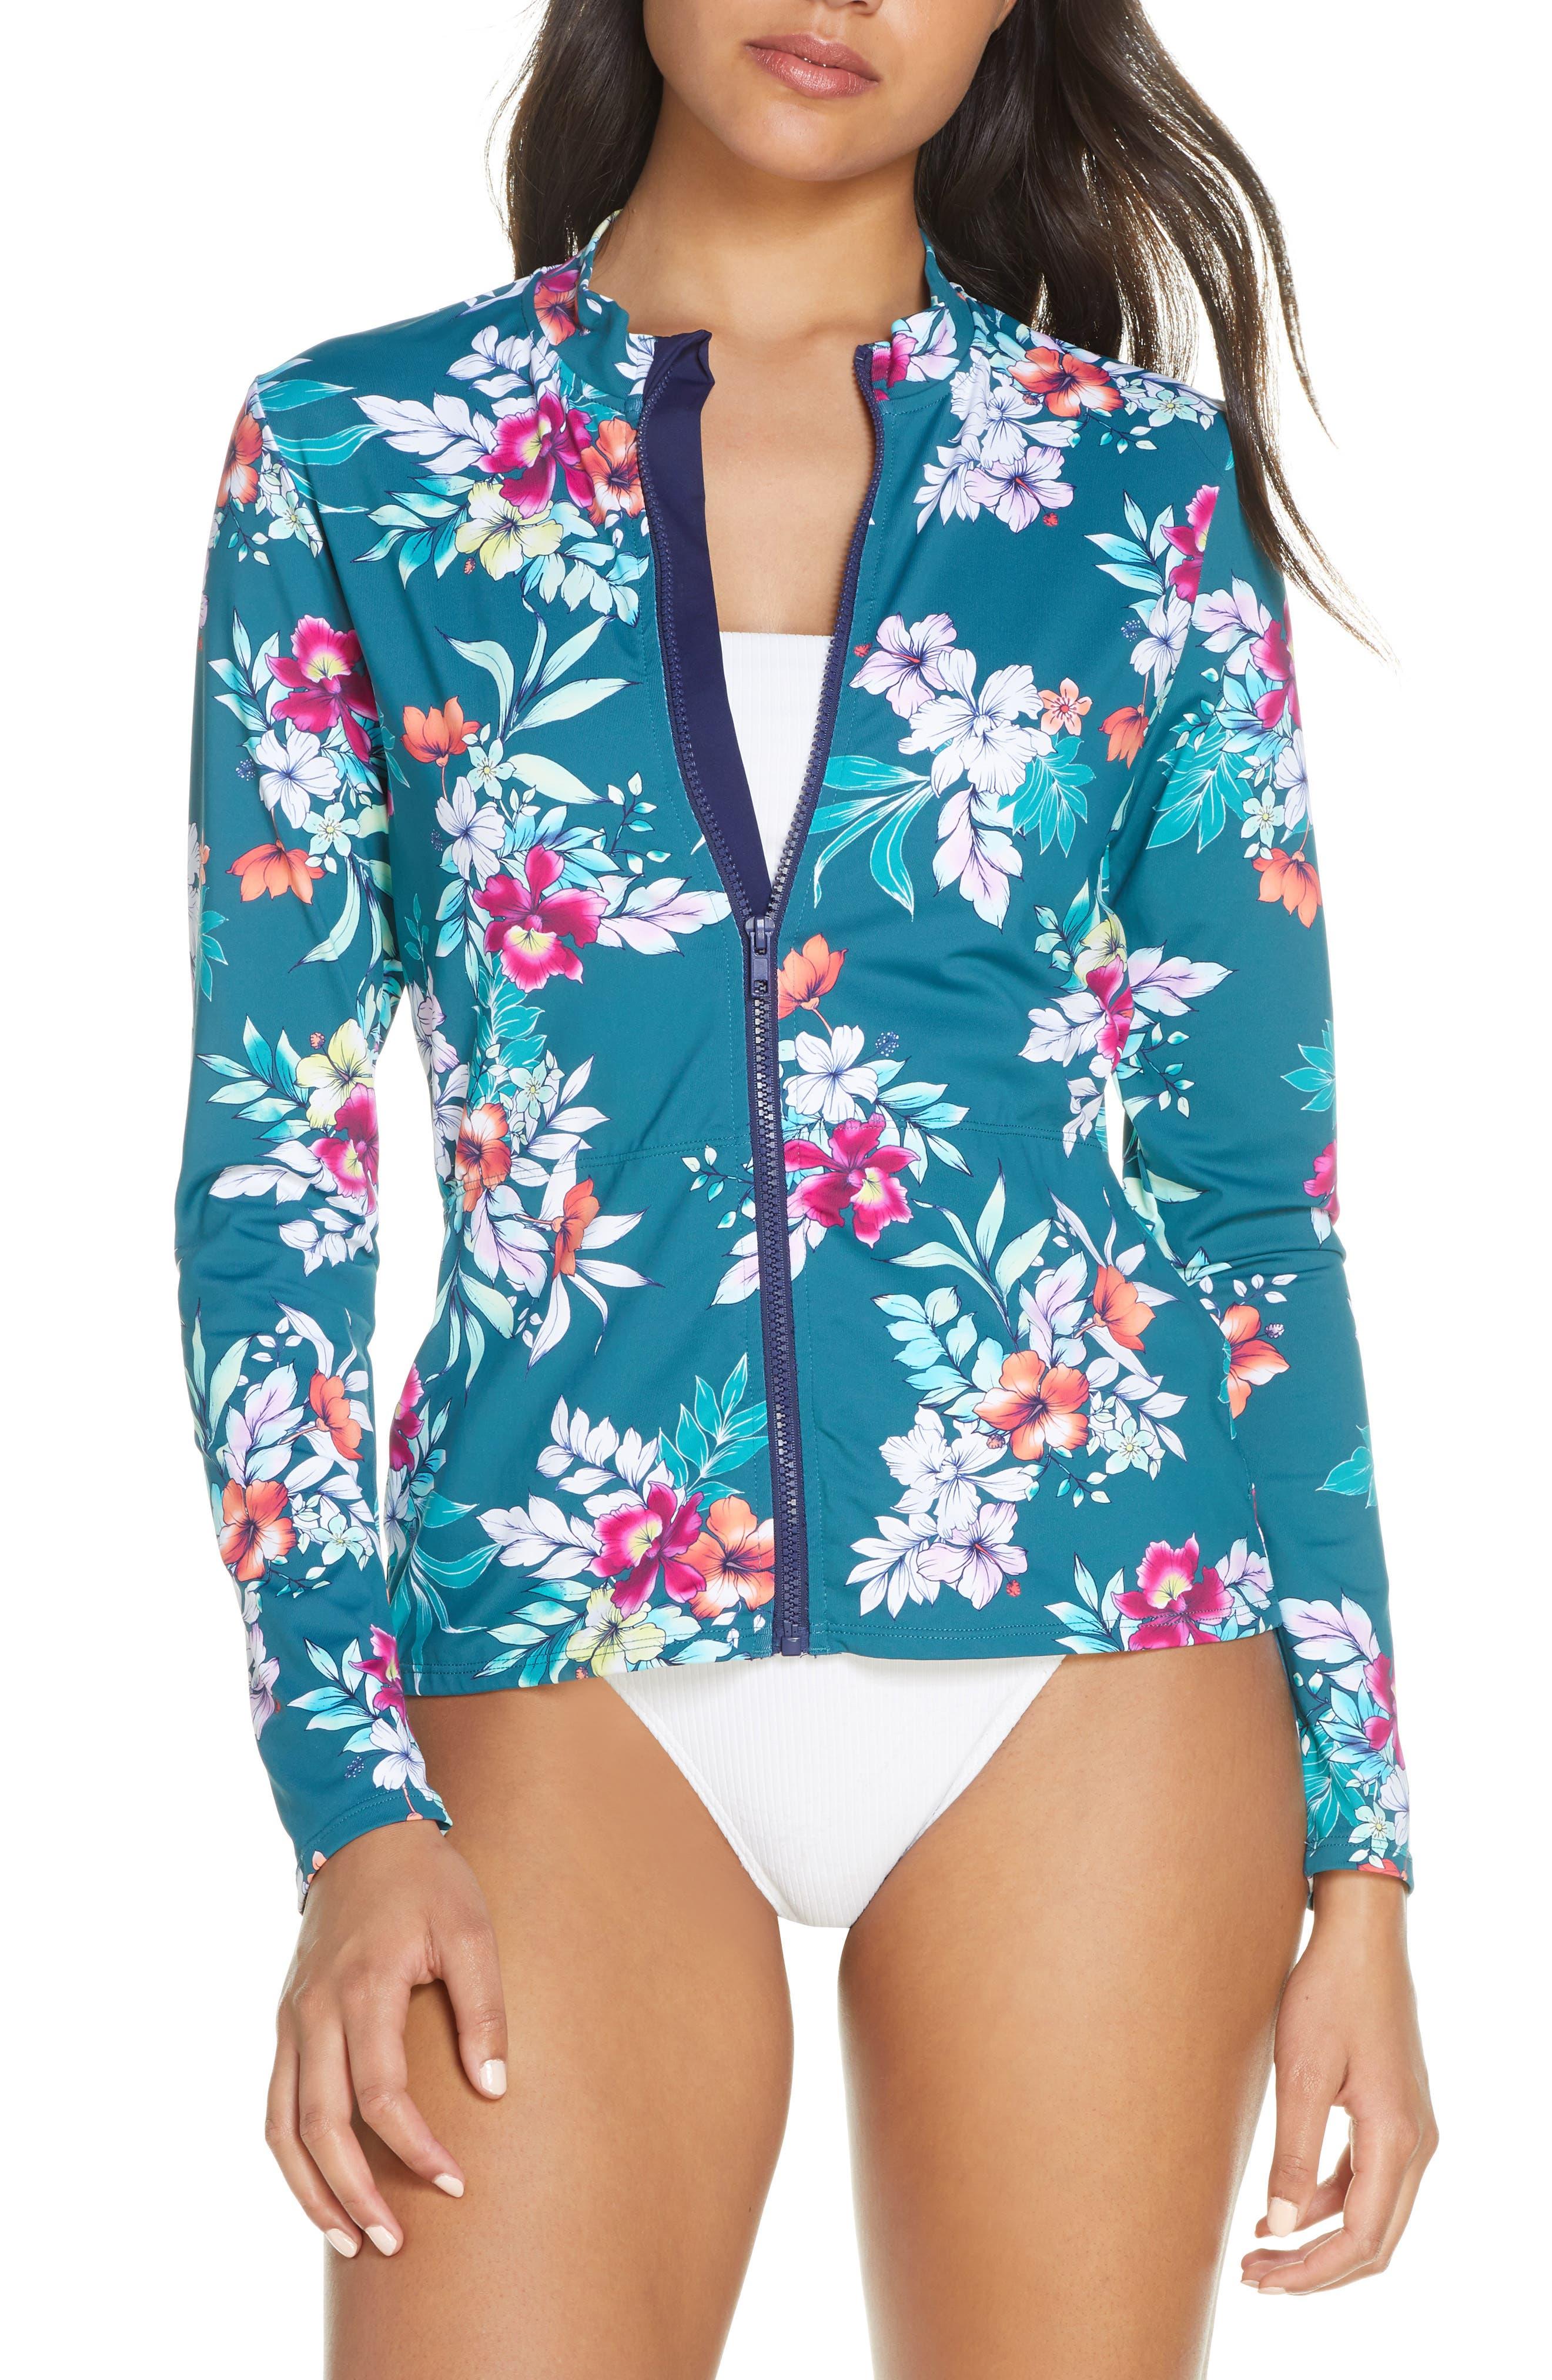 Image of Tommy Bahama Floral Springs Long Sleeve Rashguard